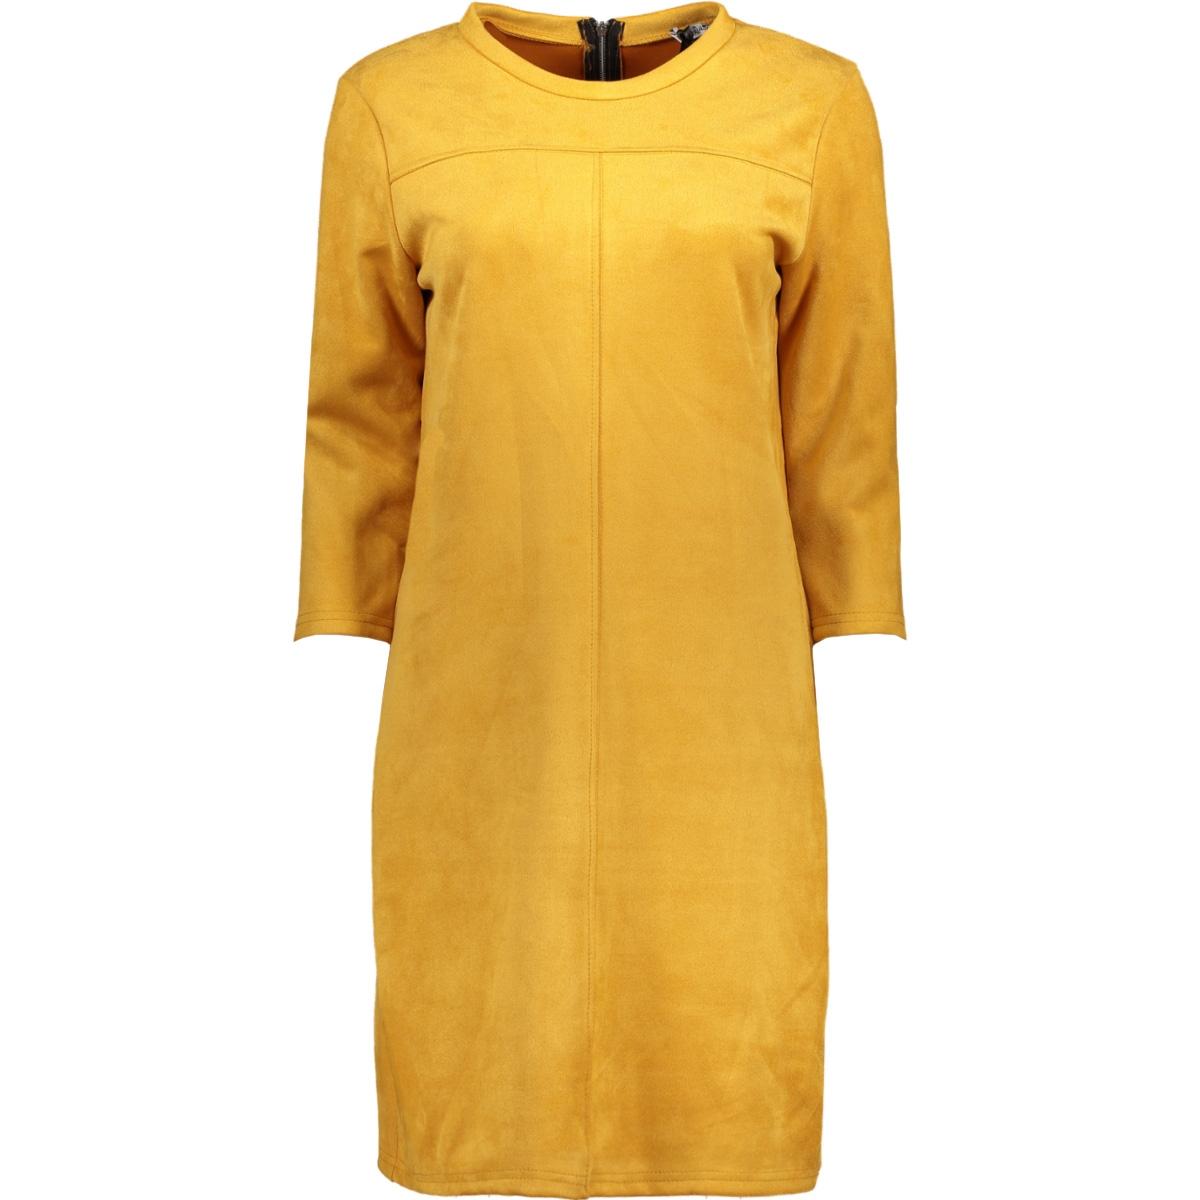 8353 britty dress luba jurk oker